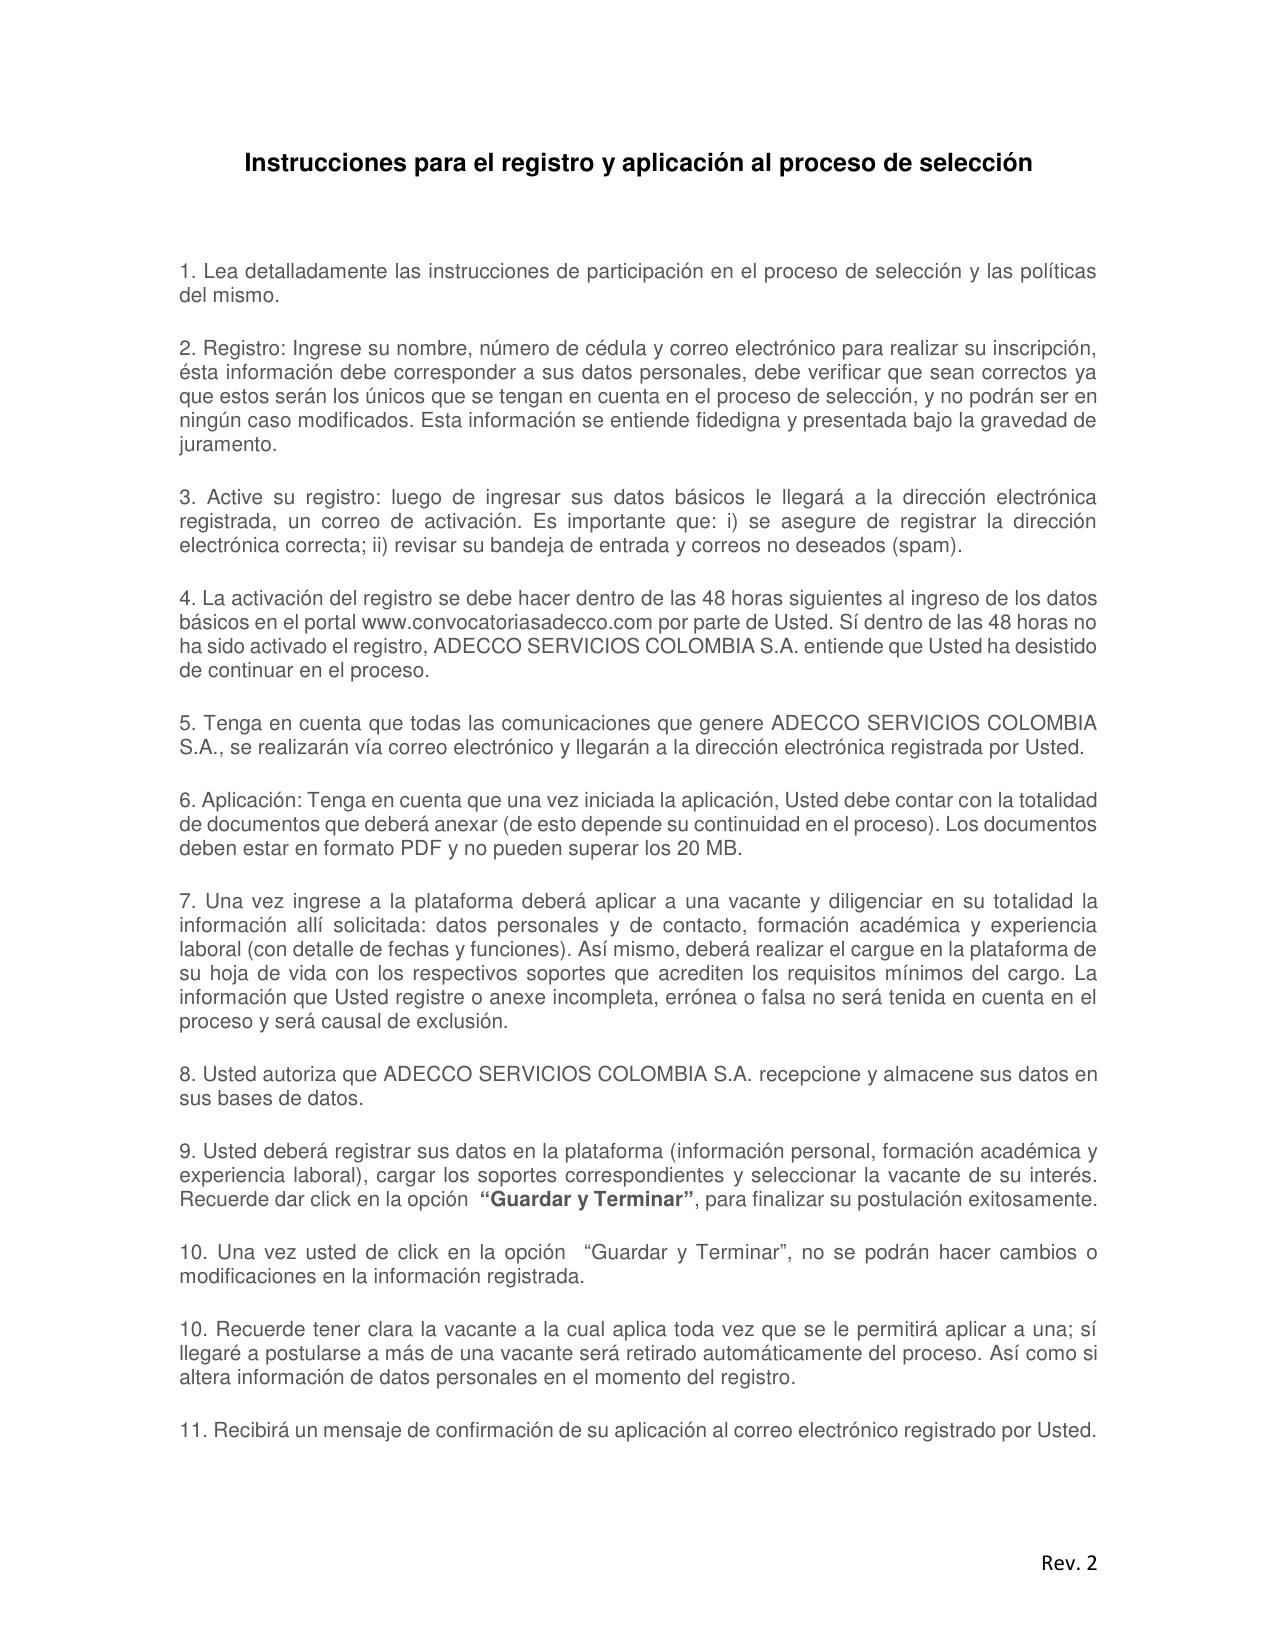 Convocatorias Adecco | Plantillas de power point | Pinterest ...